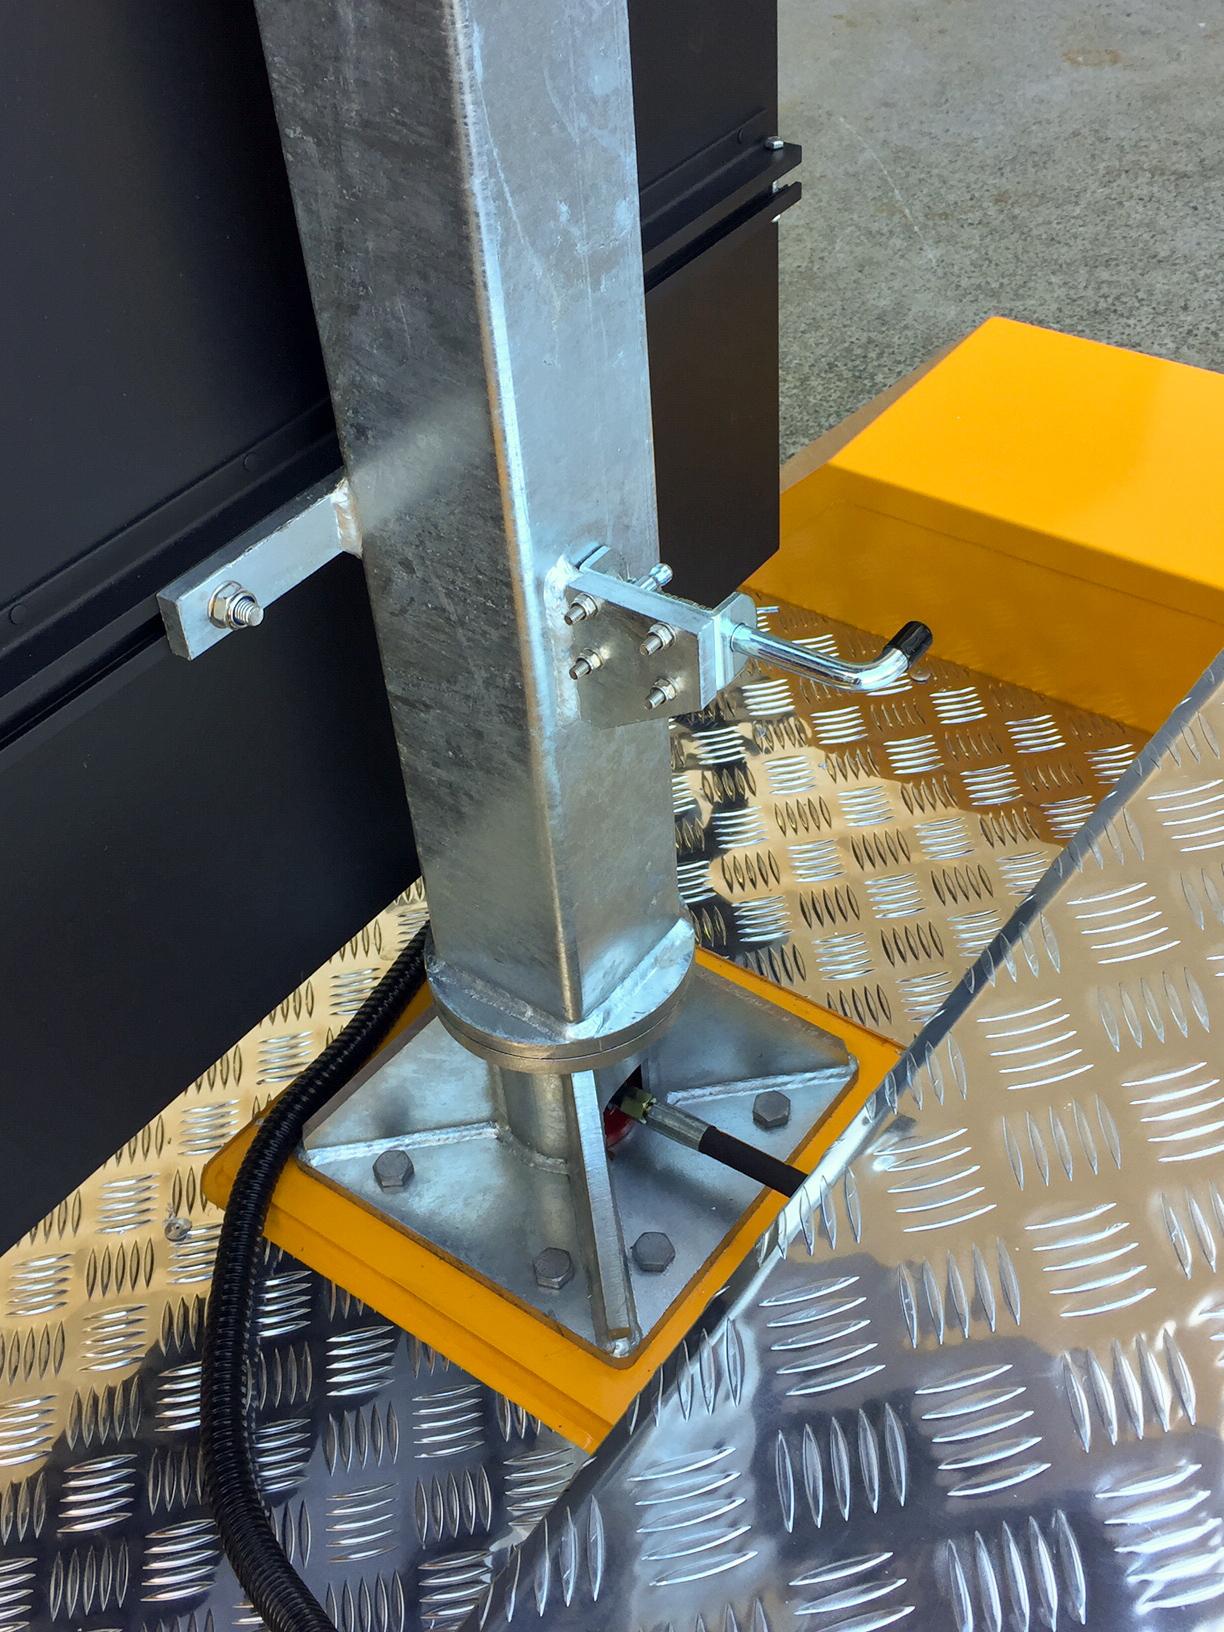 Voxson Radar Speed Signs - Hydraulic Lift System